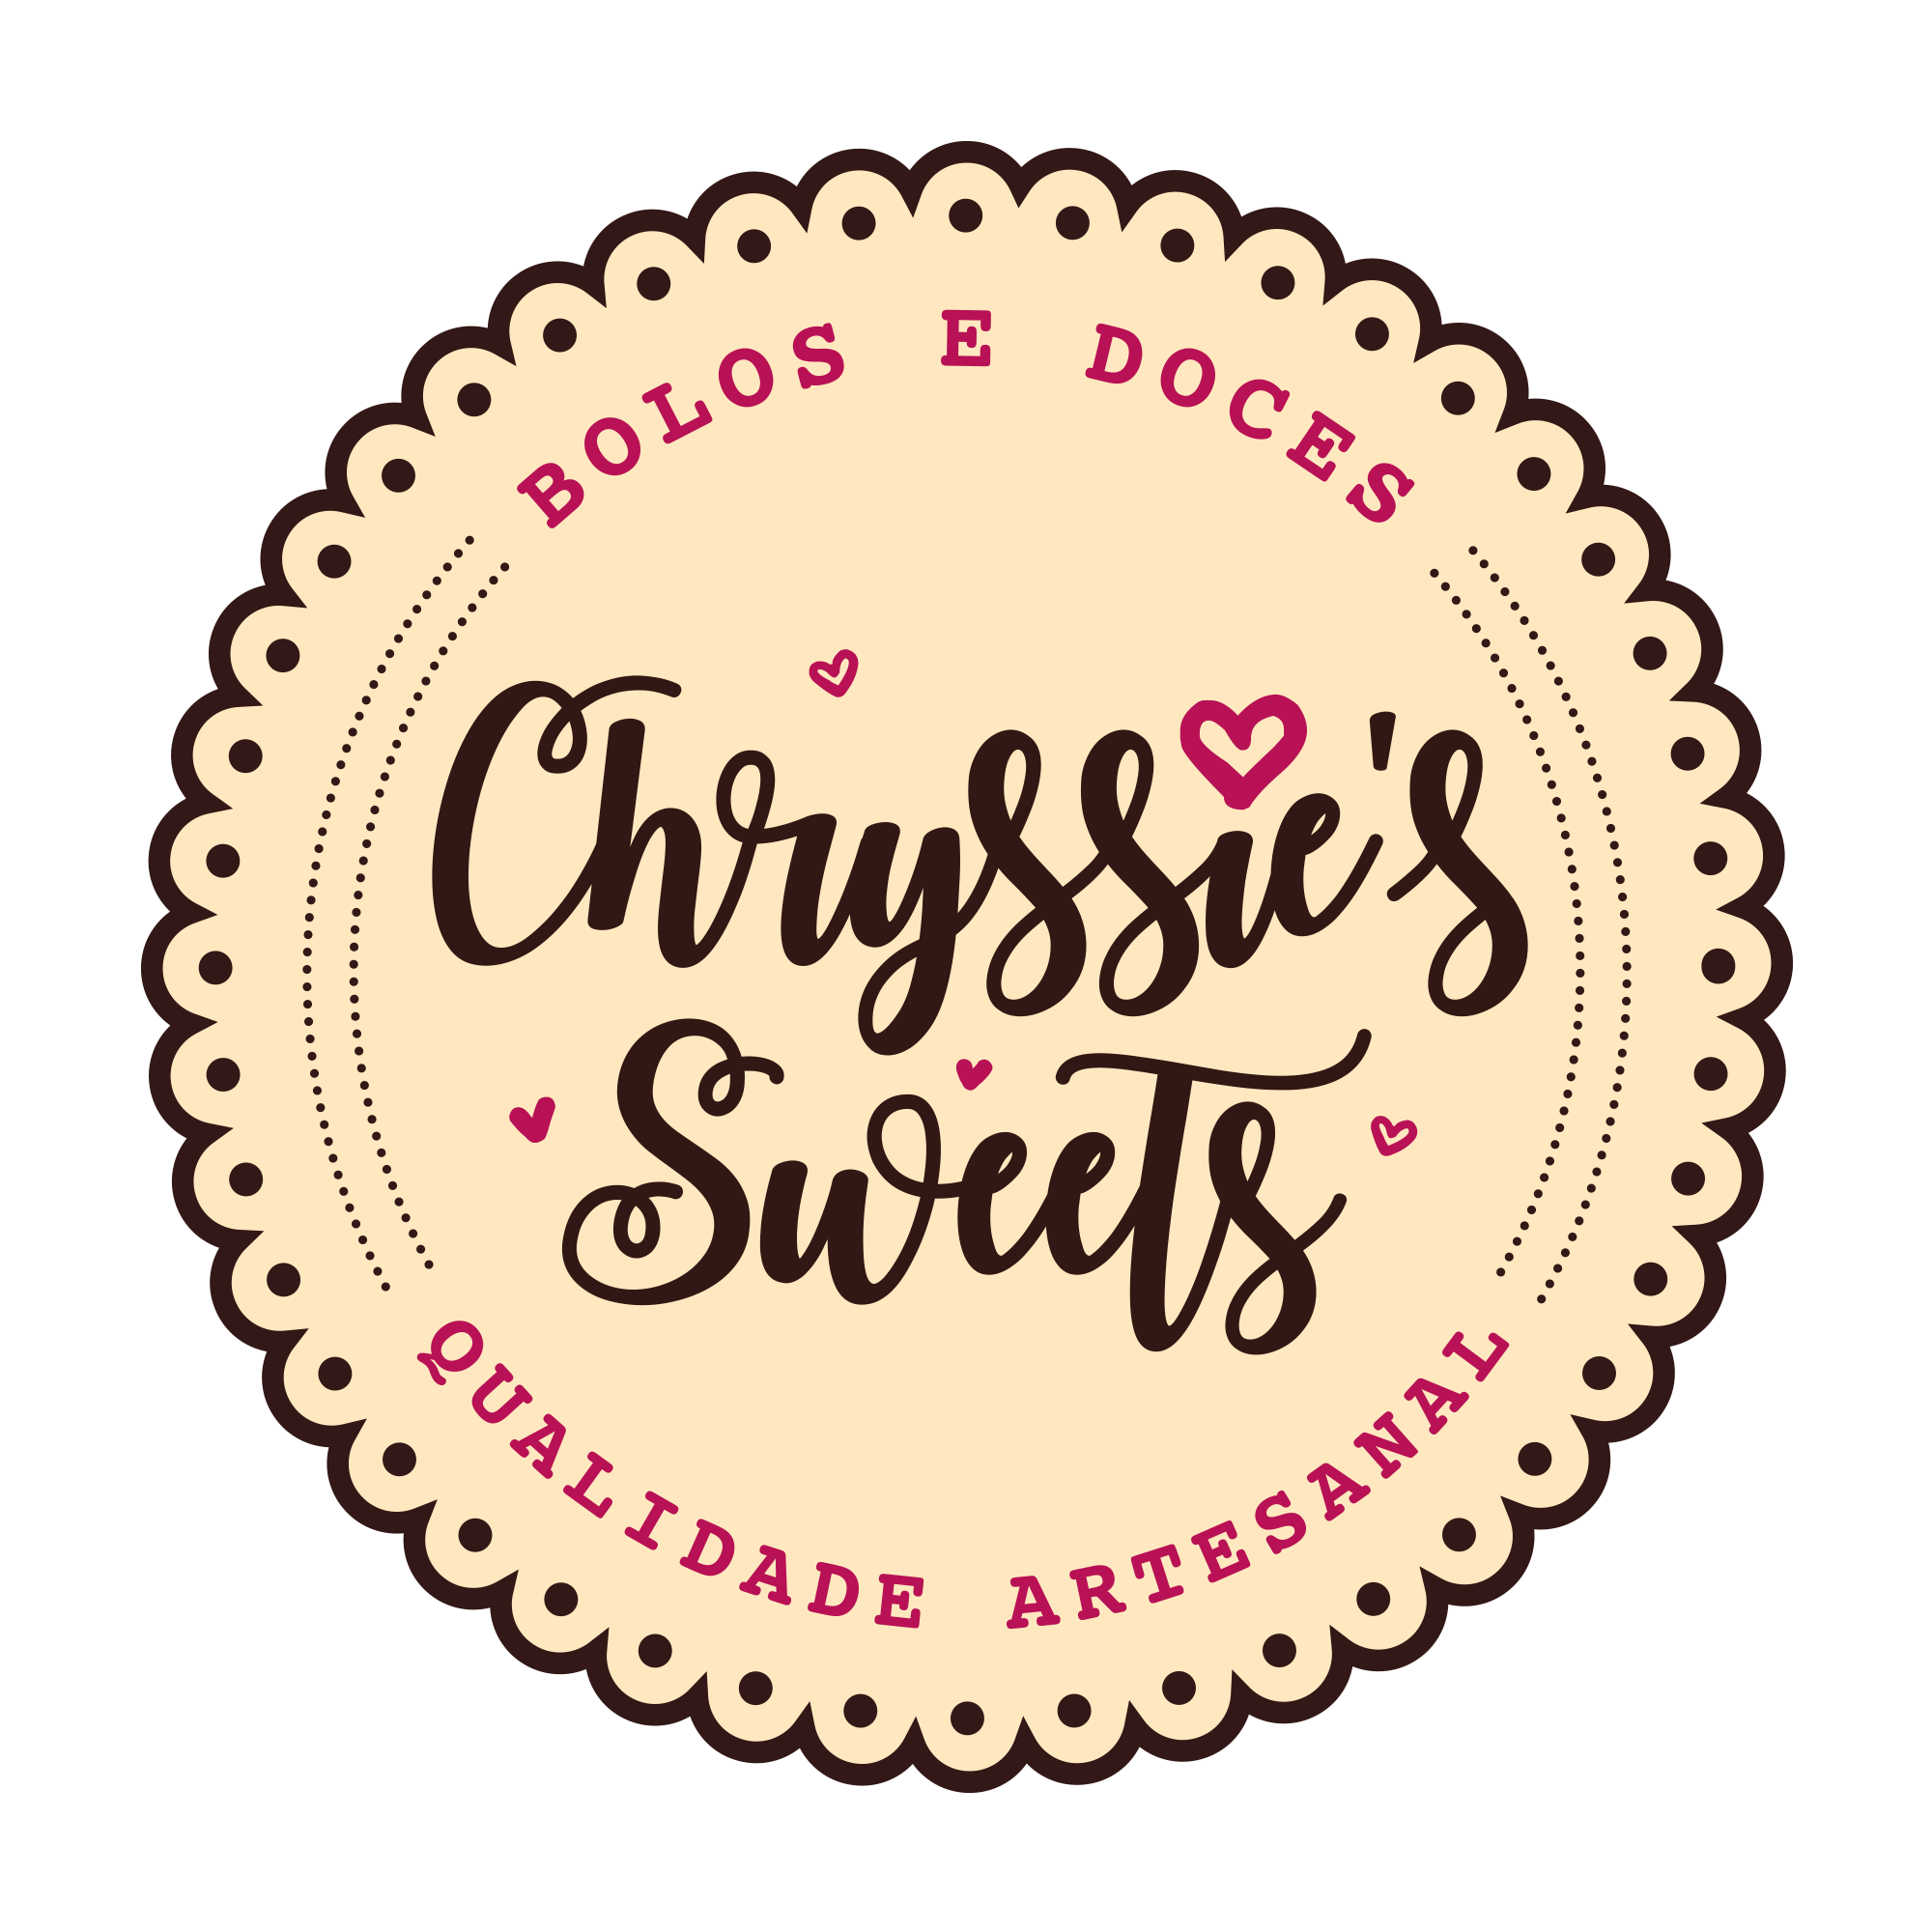 Chryssie's Sweets | Festival Gastronômico UPV 2019